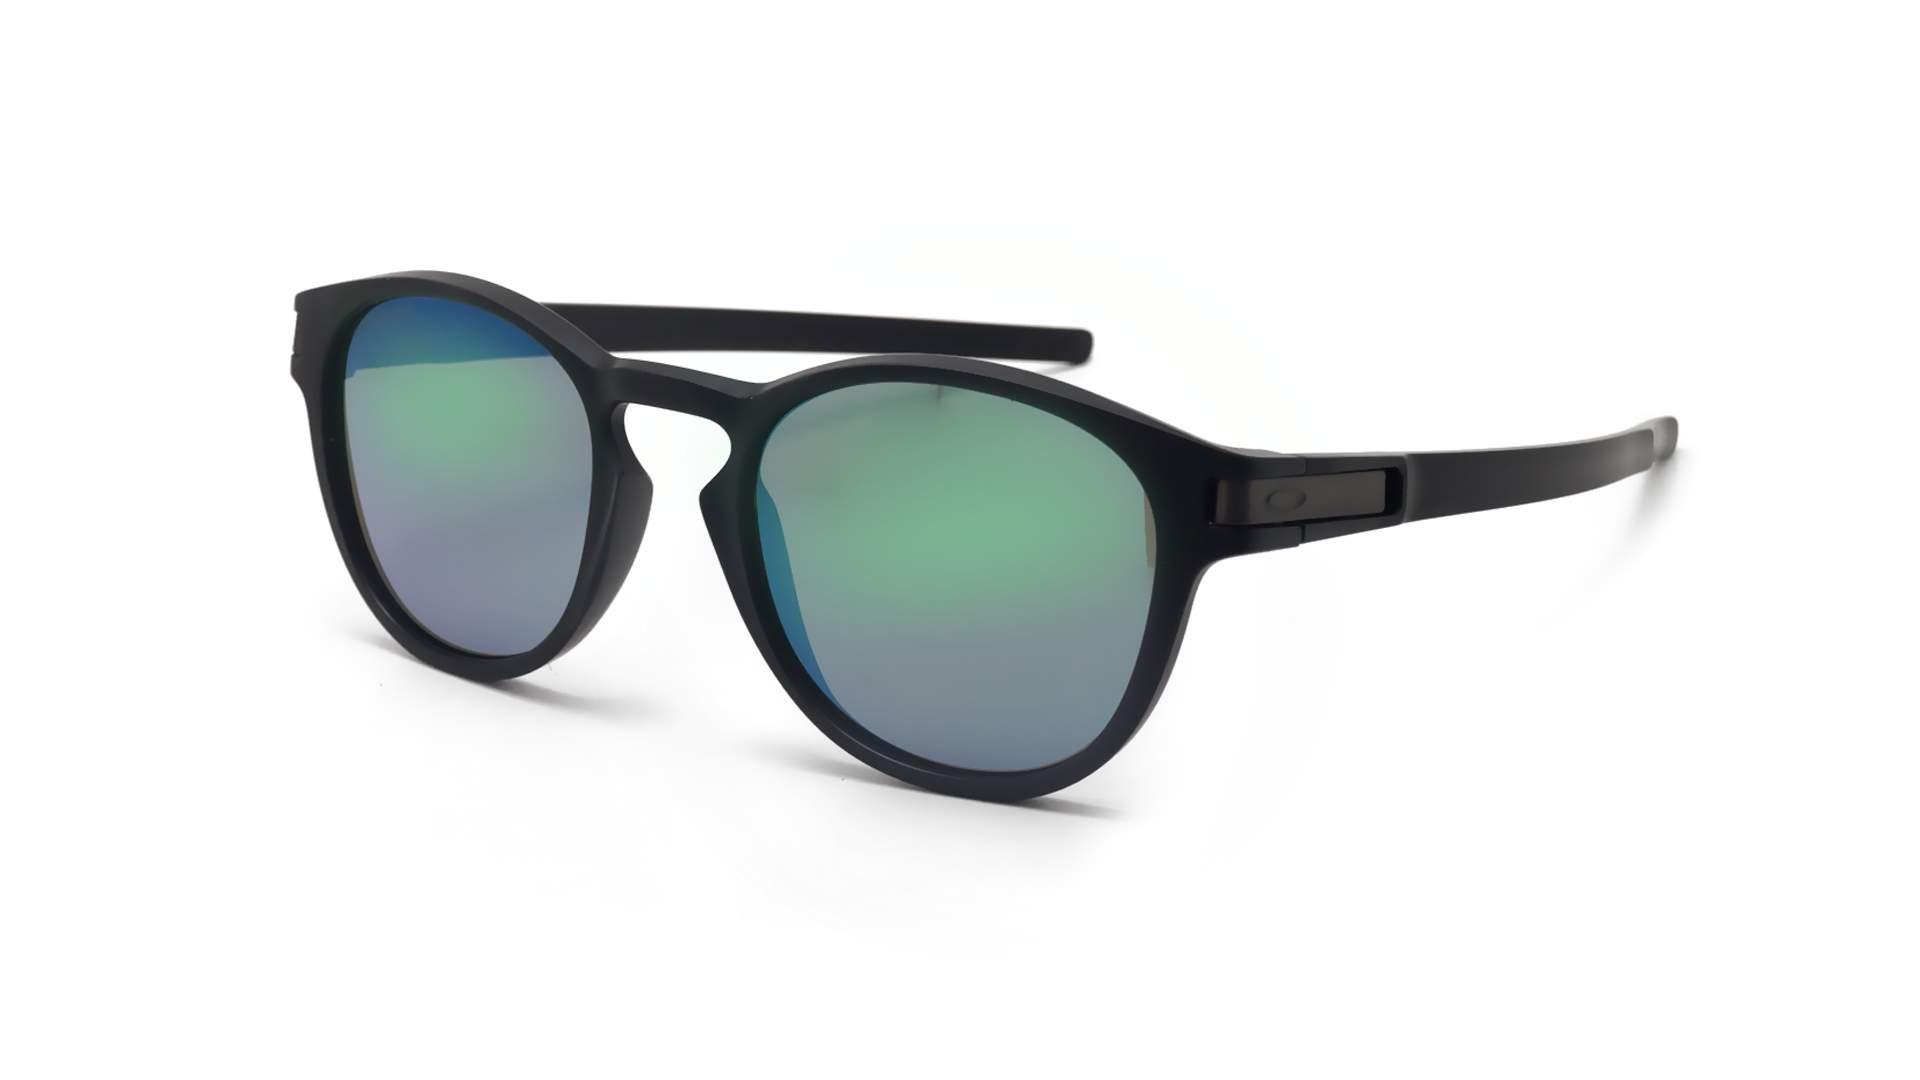 ab28b9d5a38 Sunglasses Oakley Latch Jade iridium Black Matte Prizm OO9265 28 53-21  Medium Mirror